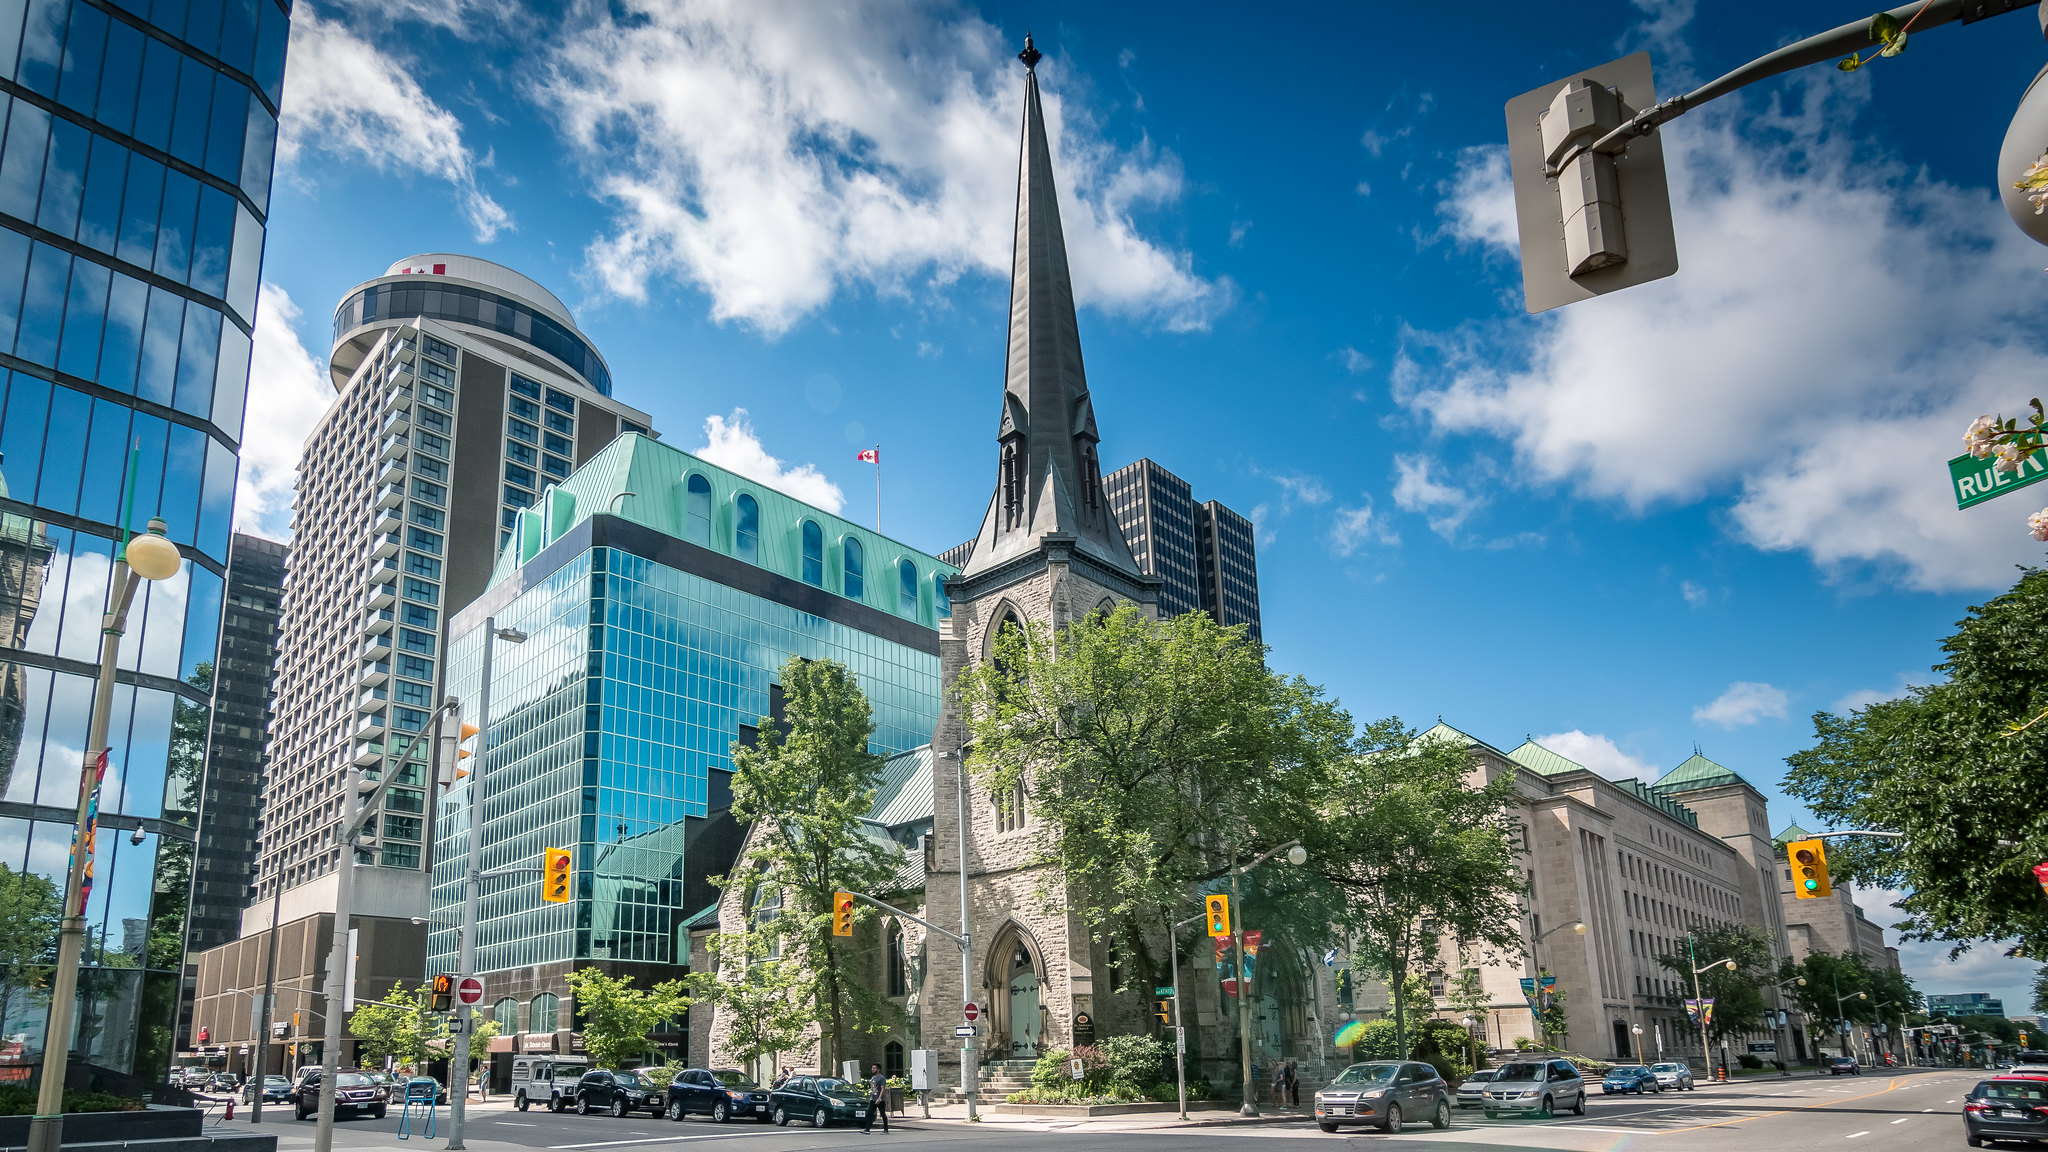 Ottawa - Ontario - [Canada]